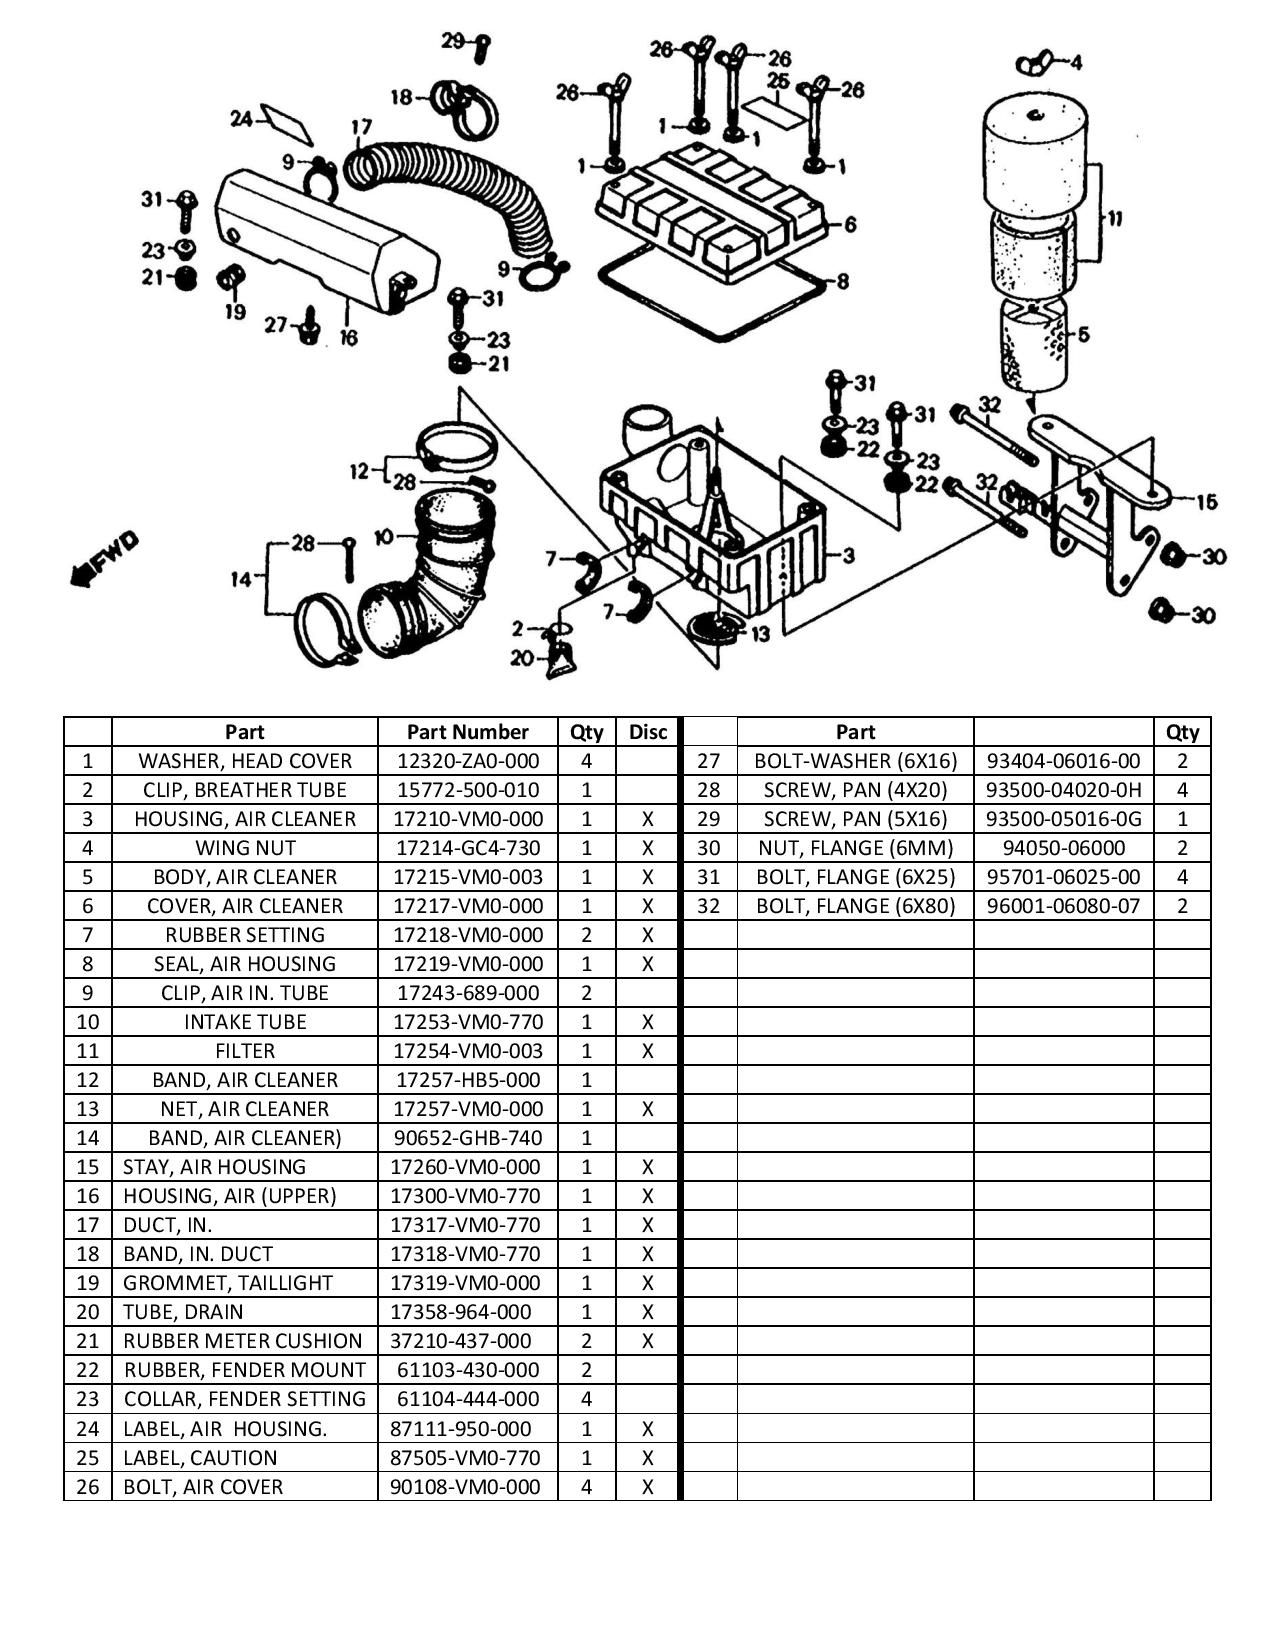 honda odyssey fl350 air intake diagram and parts list [ 1275 x 1650 Pixel ]